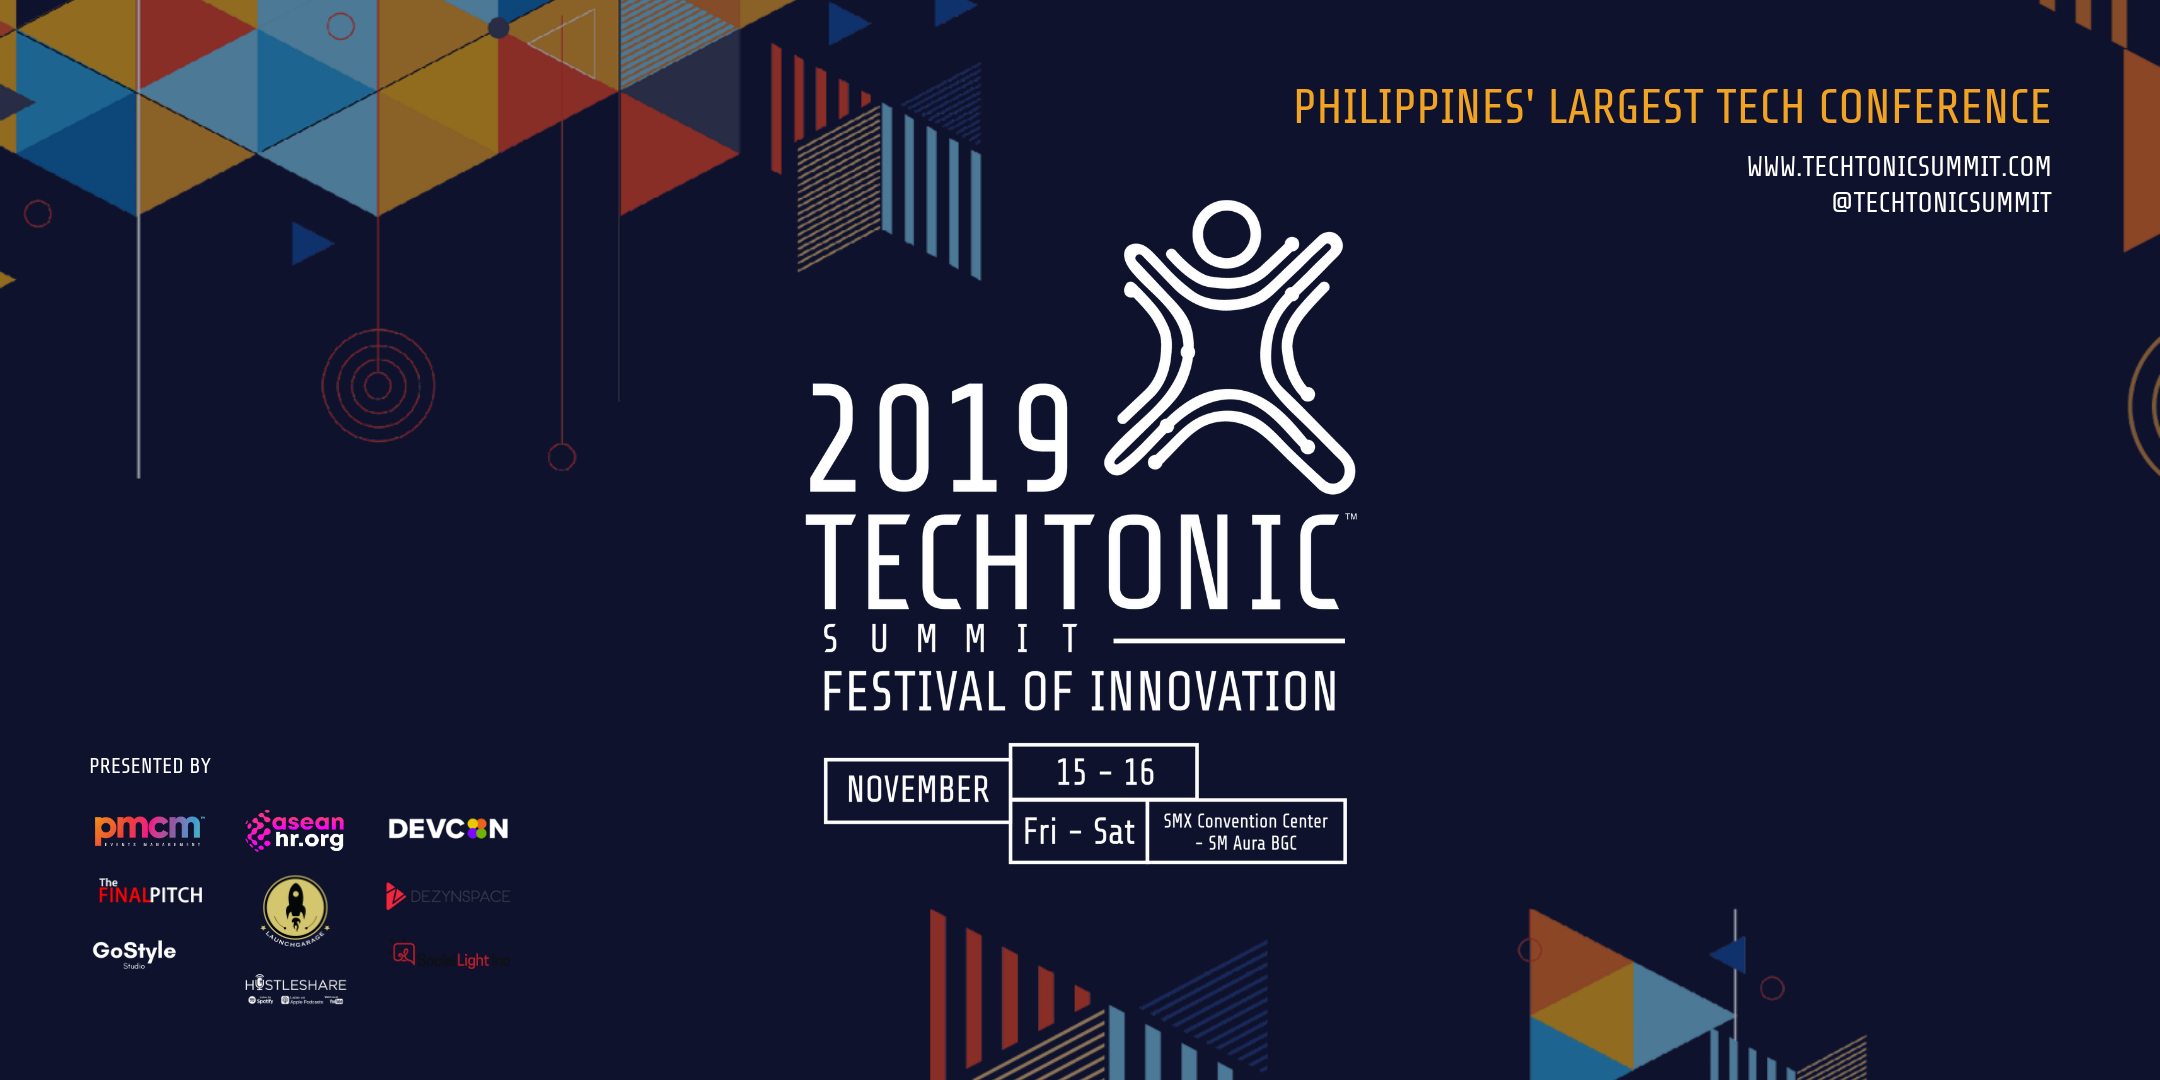 Techtonic Summit 2019 - PhilDev Community Partner